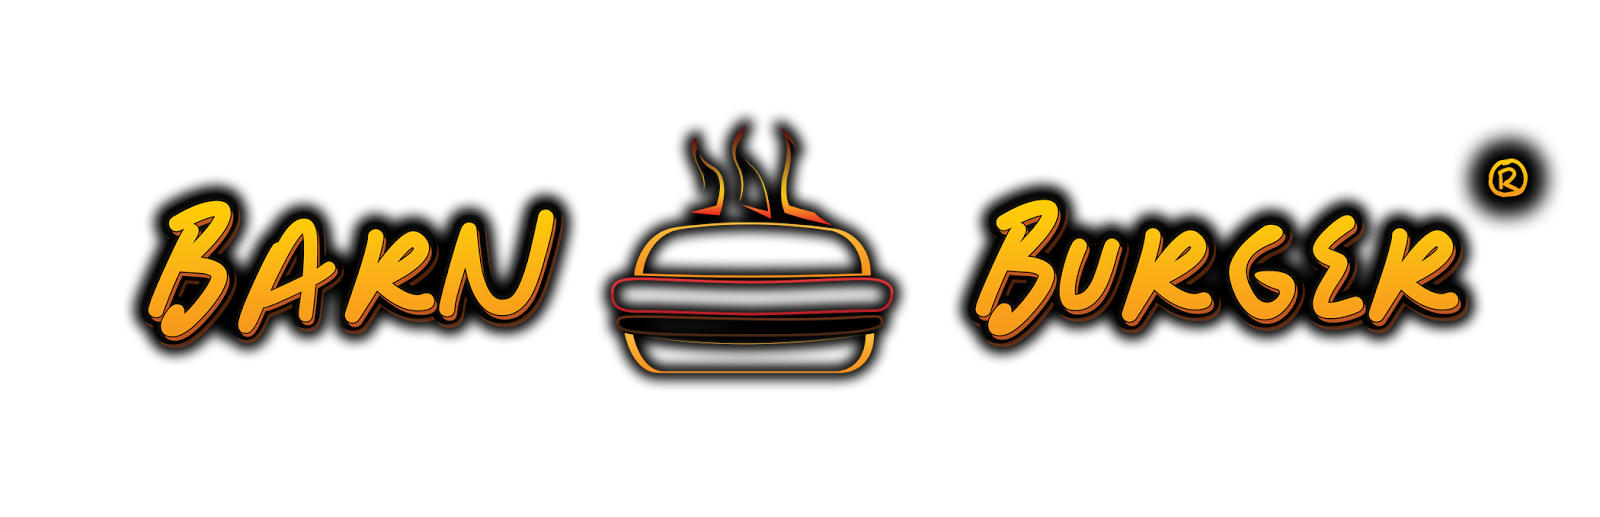 barnburgerlogo